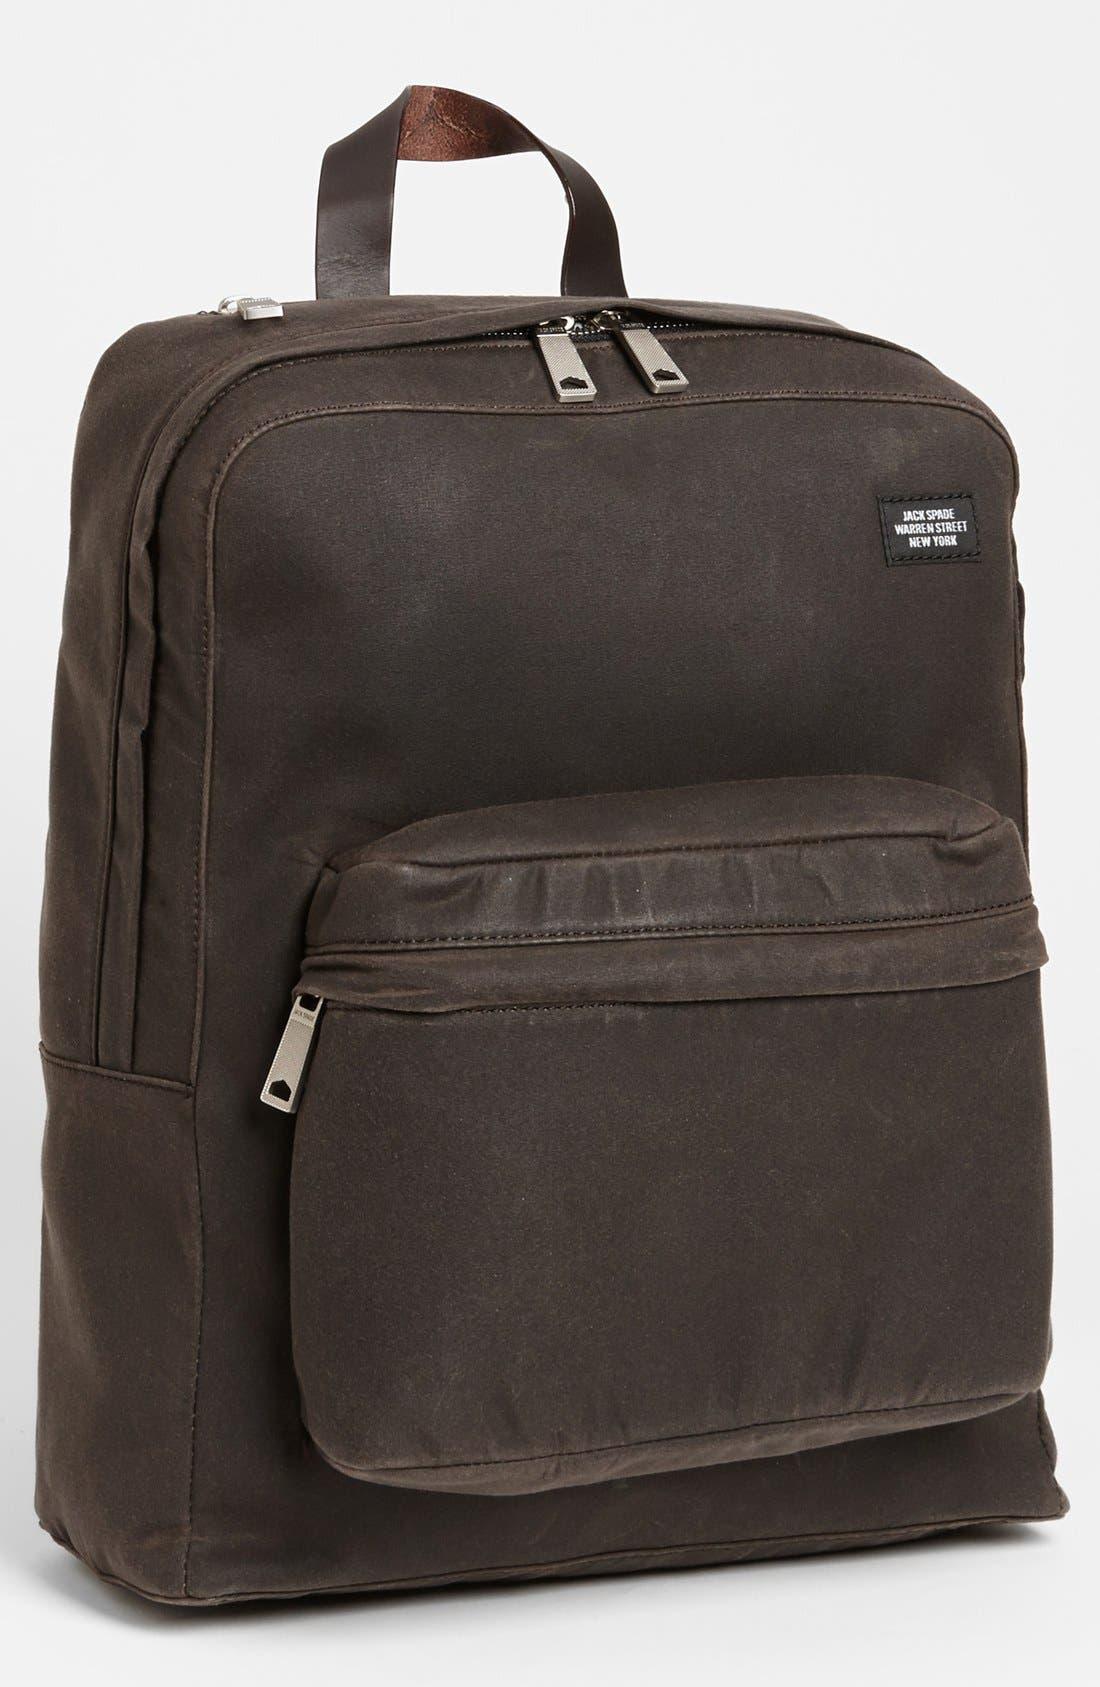 JACK SPADE, 'Waxwear' Backpack, Main thumbnail 1, color, 215